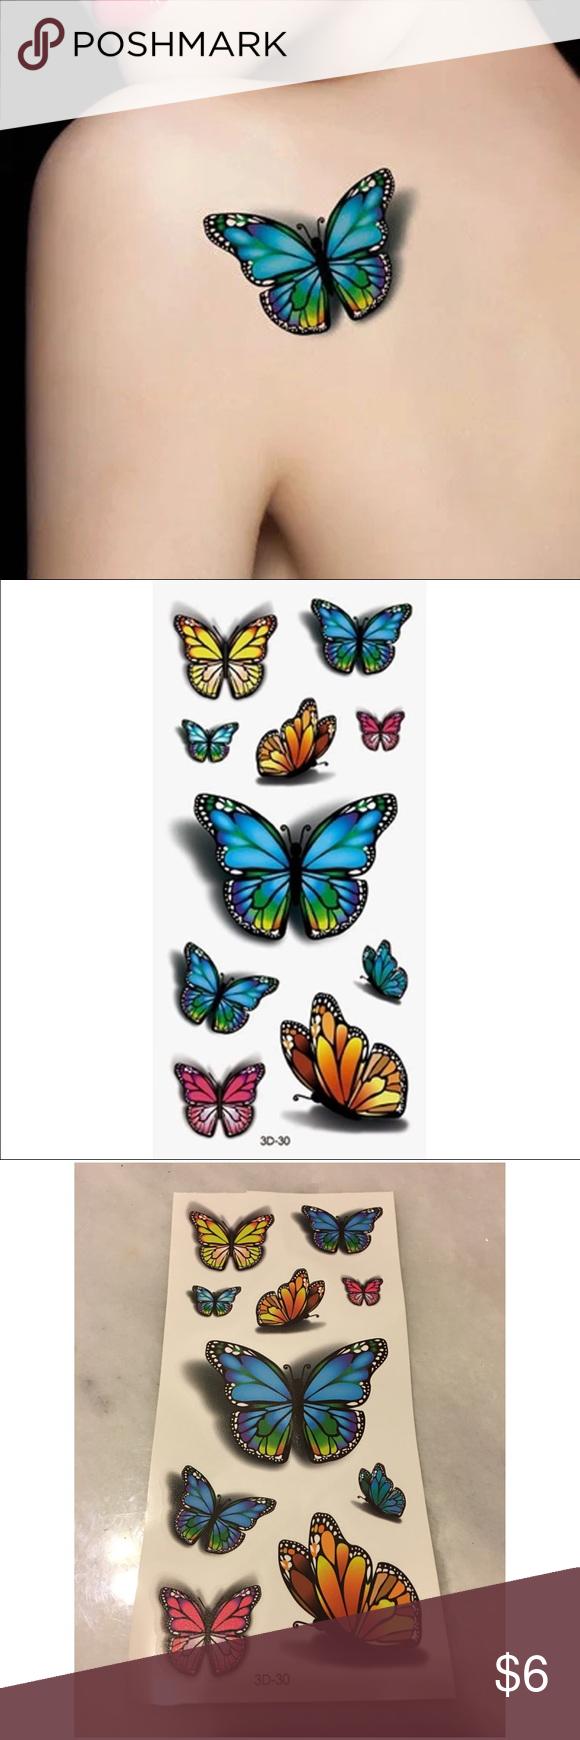 item 🎀 3D butterfly temp tattoo 10 butterfly temporary